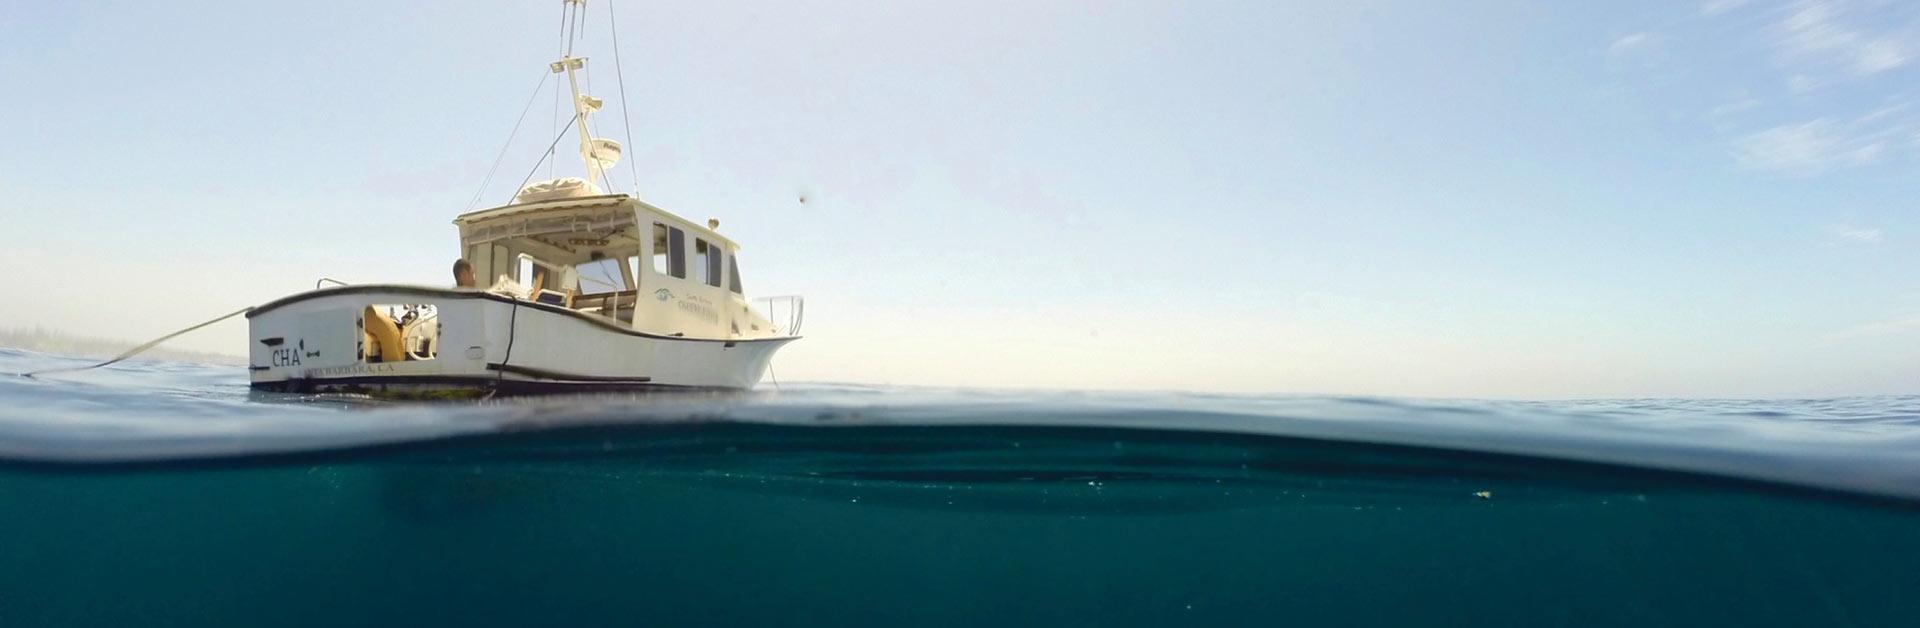 Santa Barbara Channelkeeper's boat.